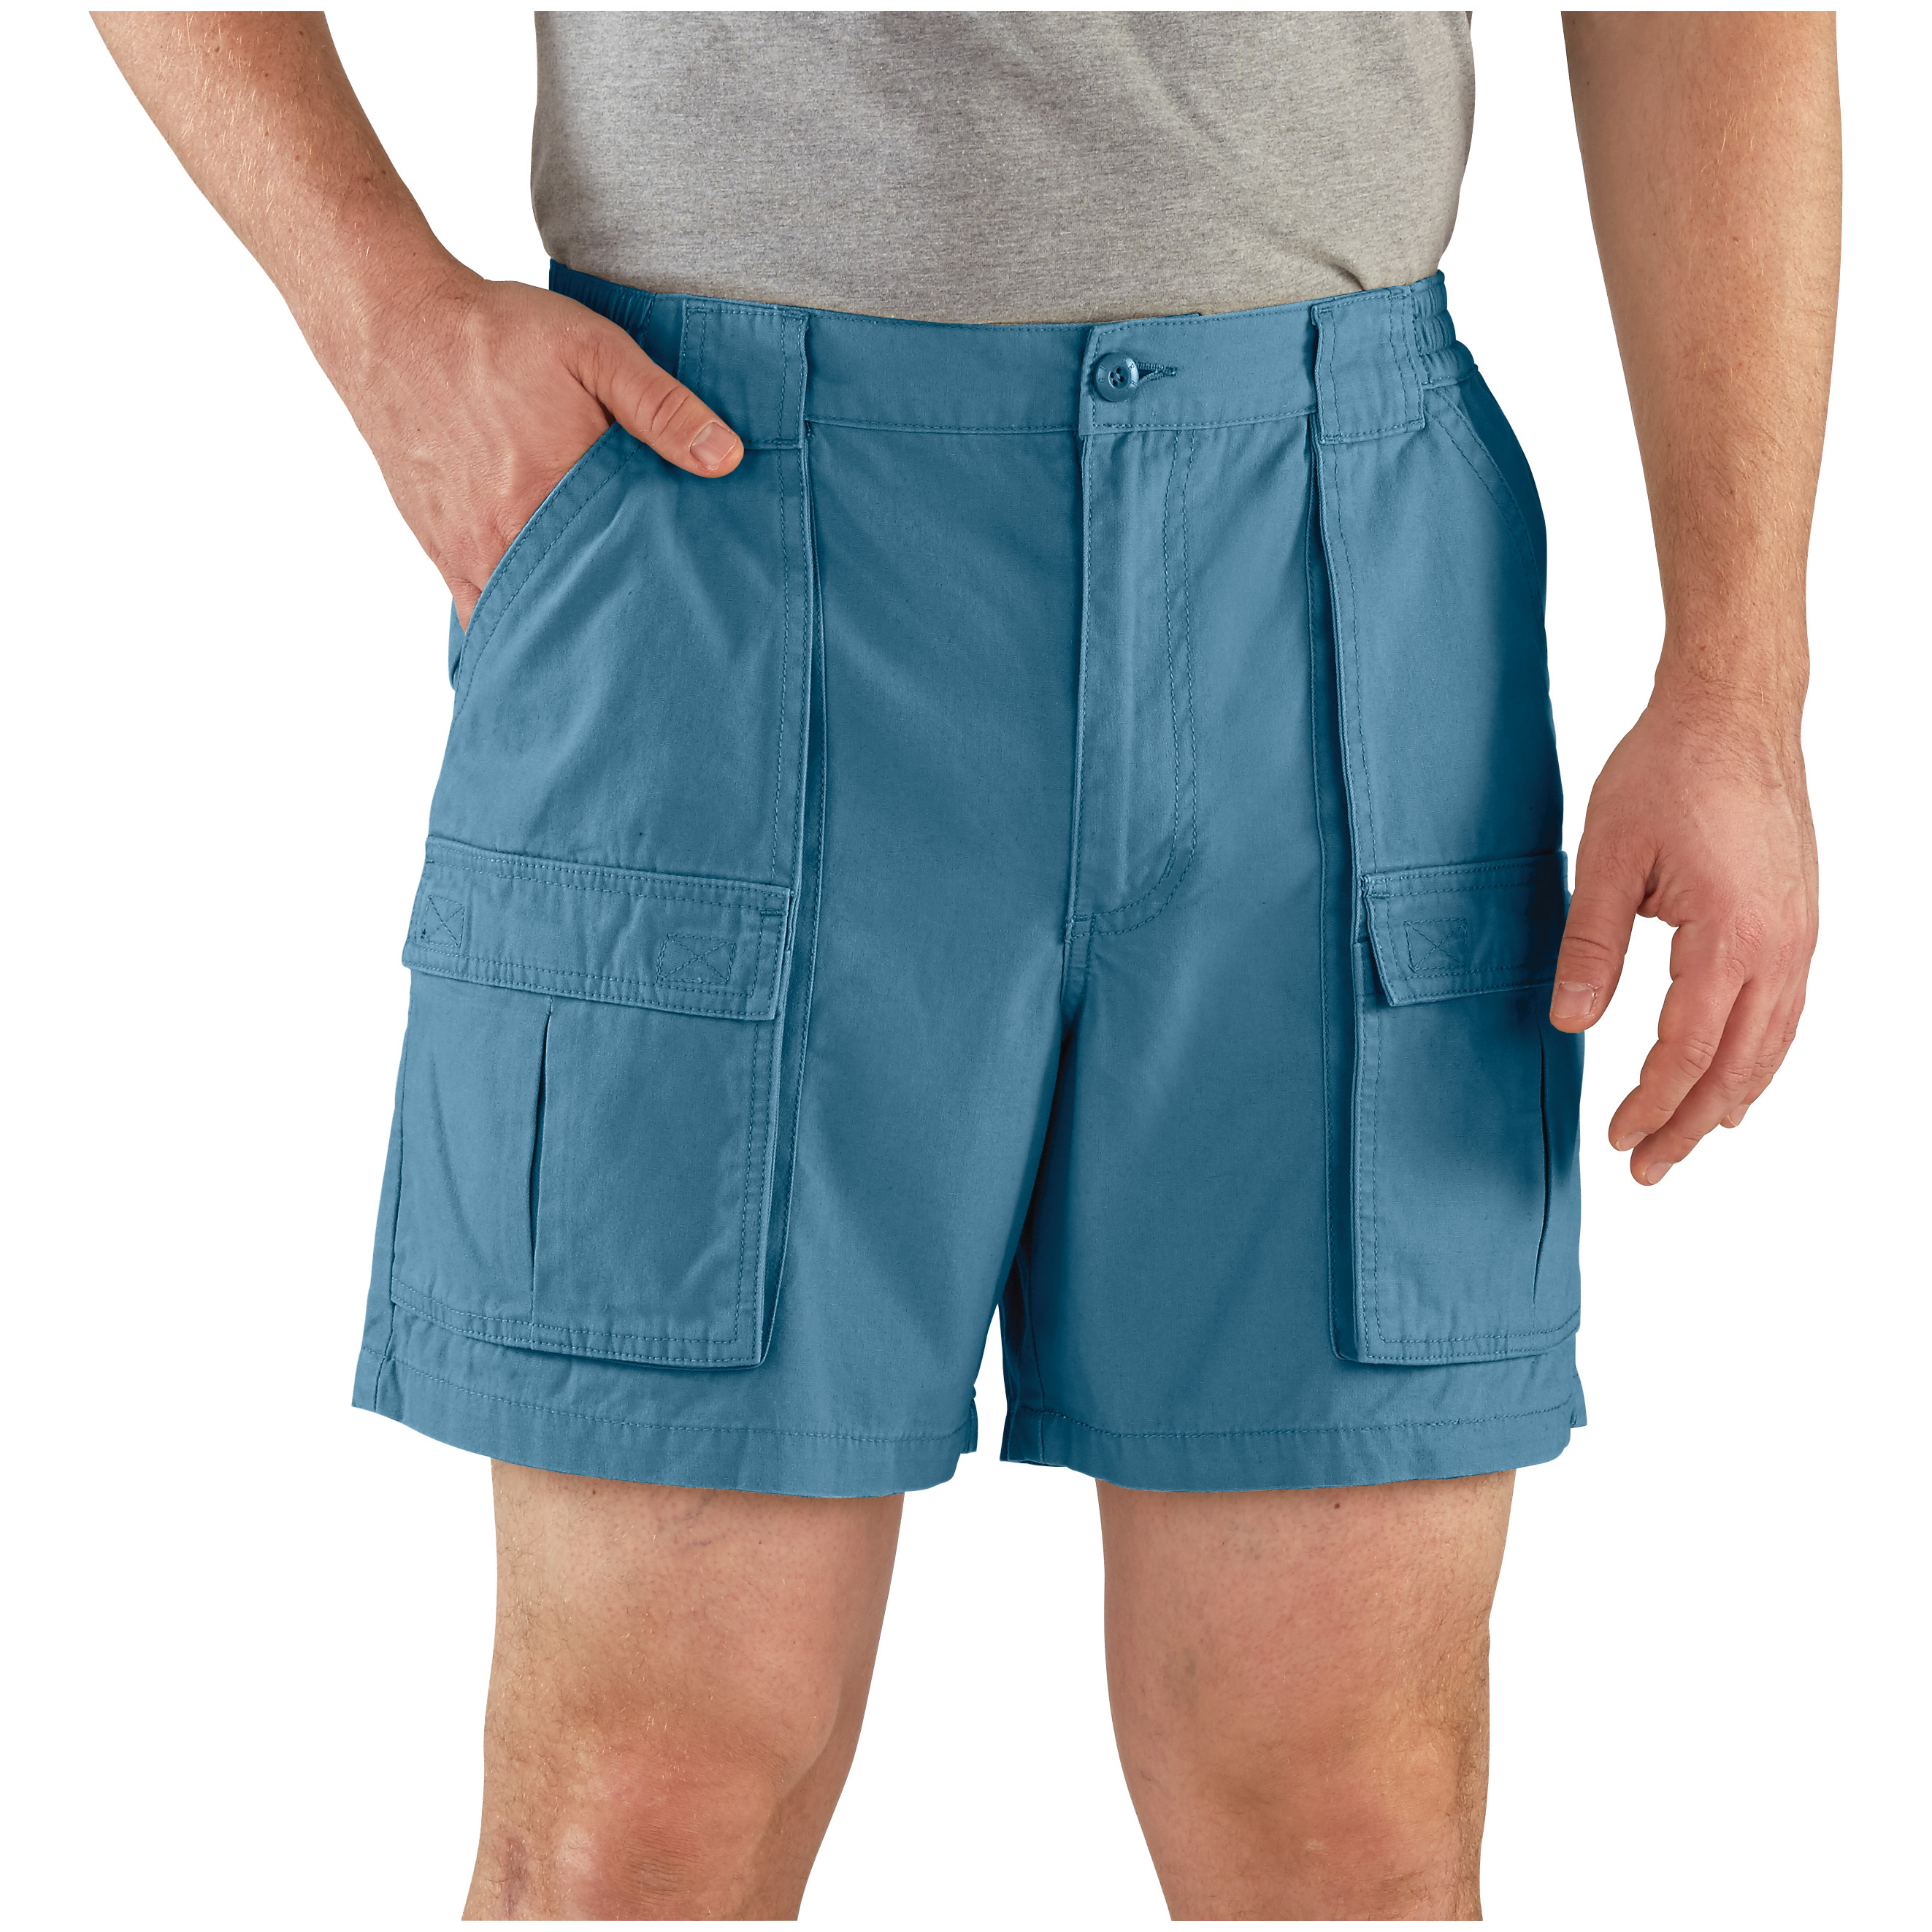 Guide Gear Men's Wakota Cargo Shorts 6 inch Inseam - $24 ...